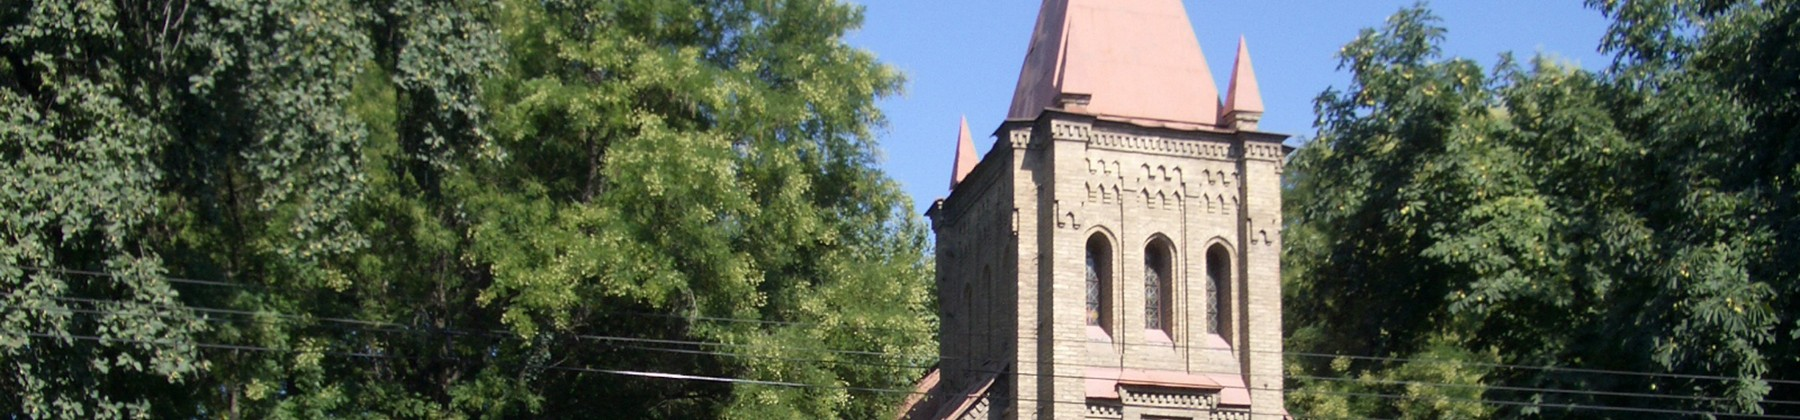 Evangelical Lutheran Church - 1